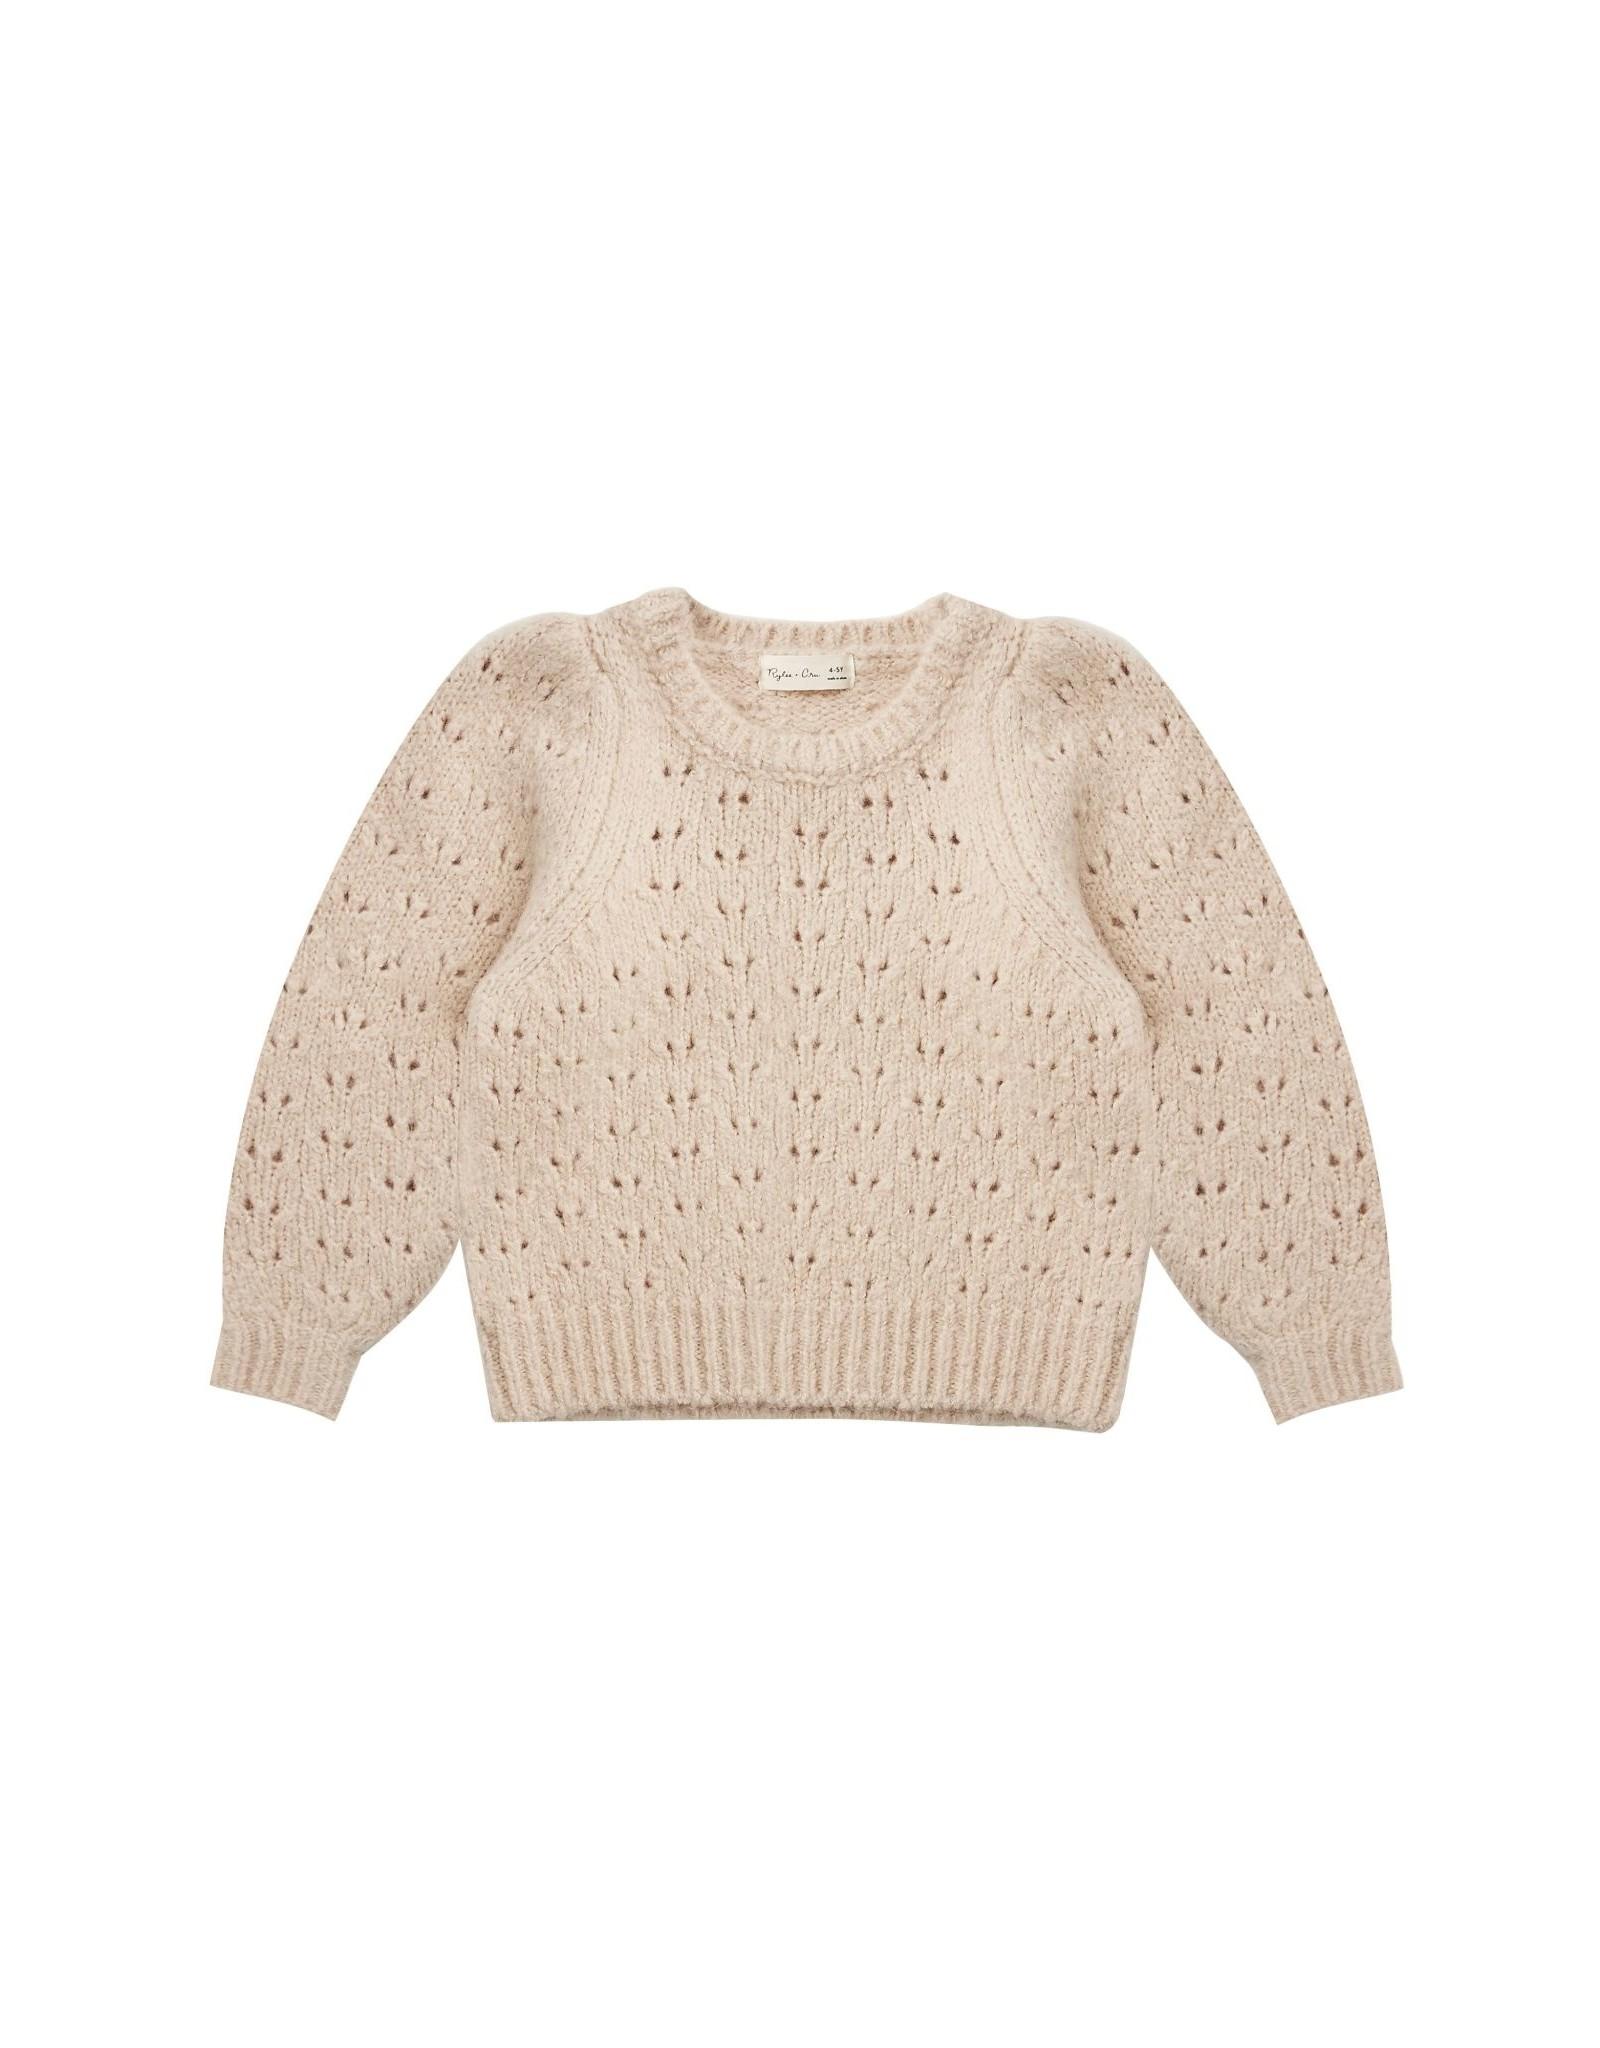 Rylee and Cru balloon sweater- beige